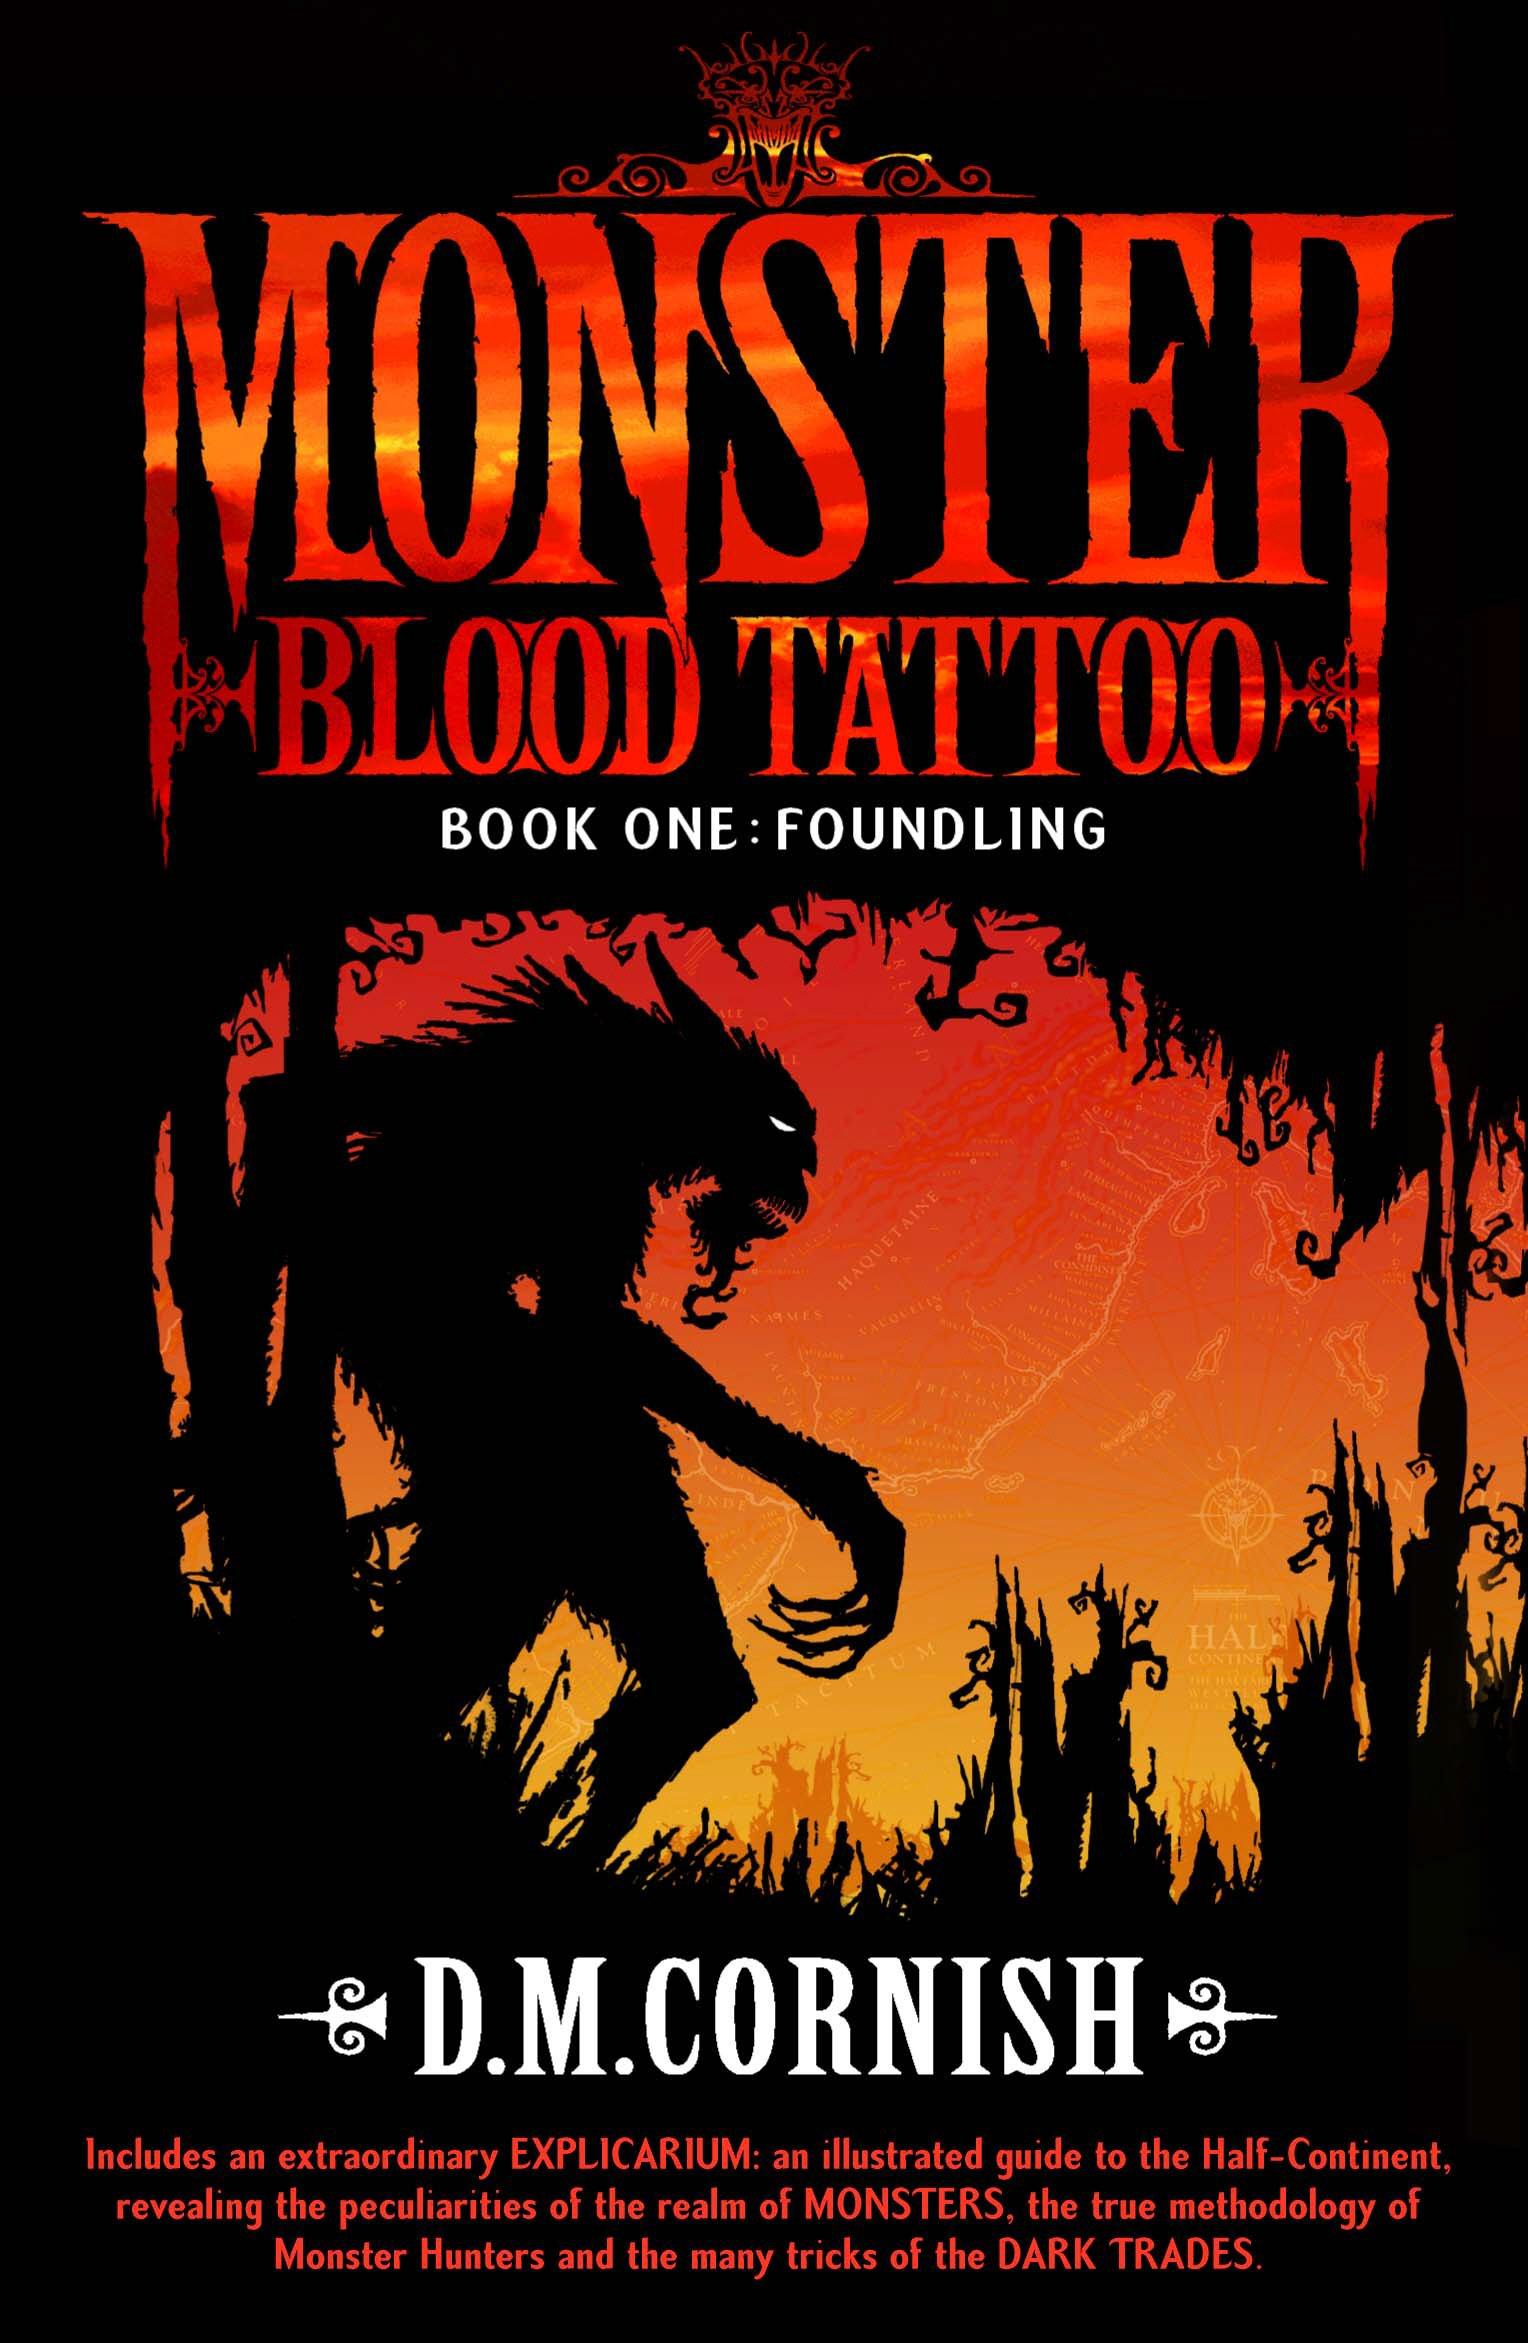 Monster Blood Tattoo Foundling Book One Cornish D M 9780552574860 Amazon Com Books